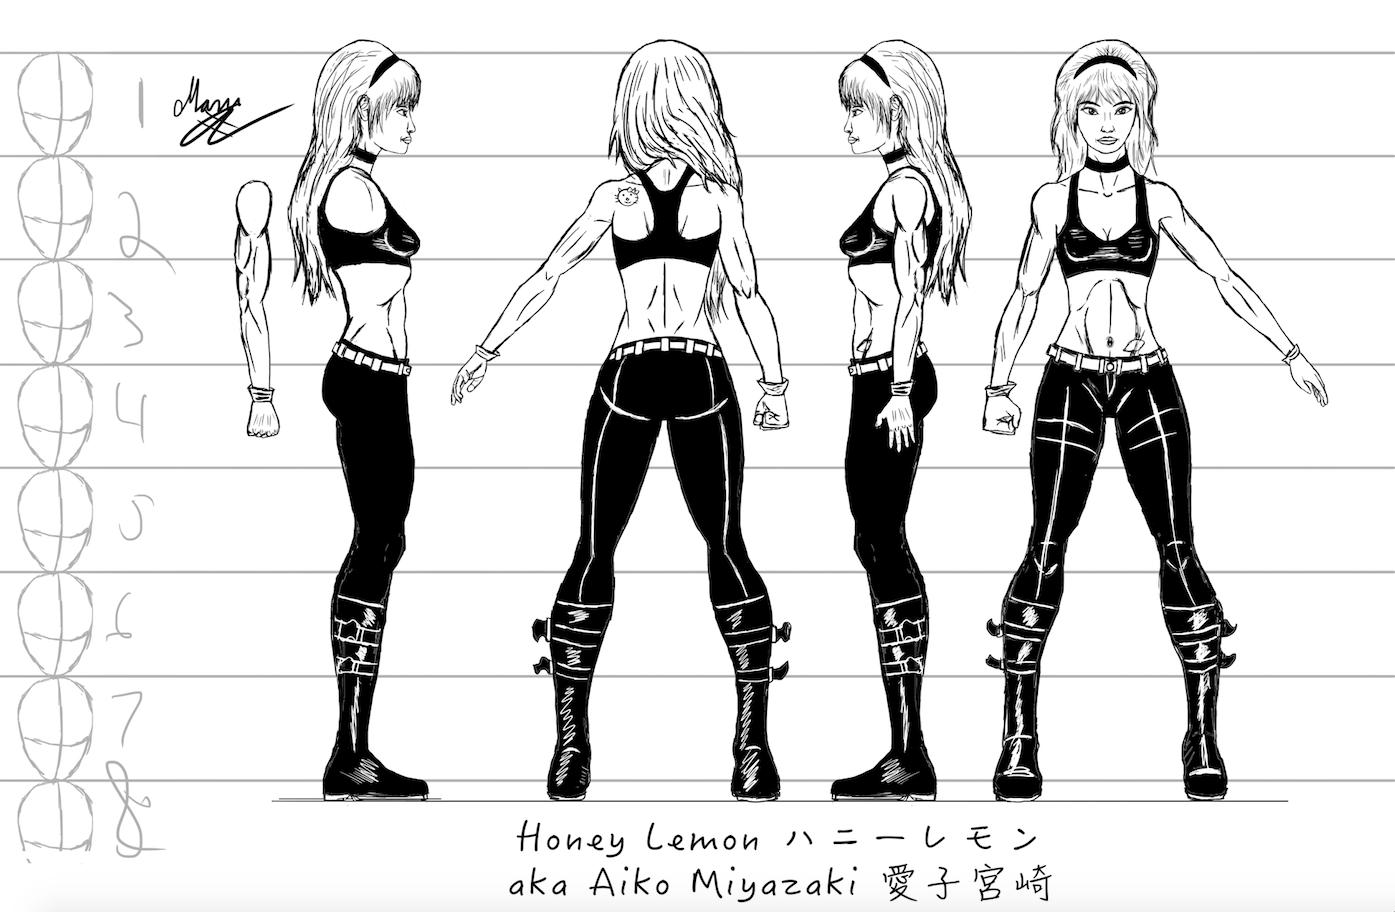 Honey Lemon Character Sheet #1